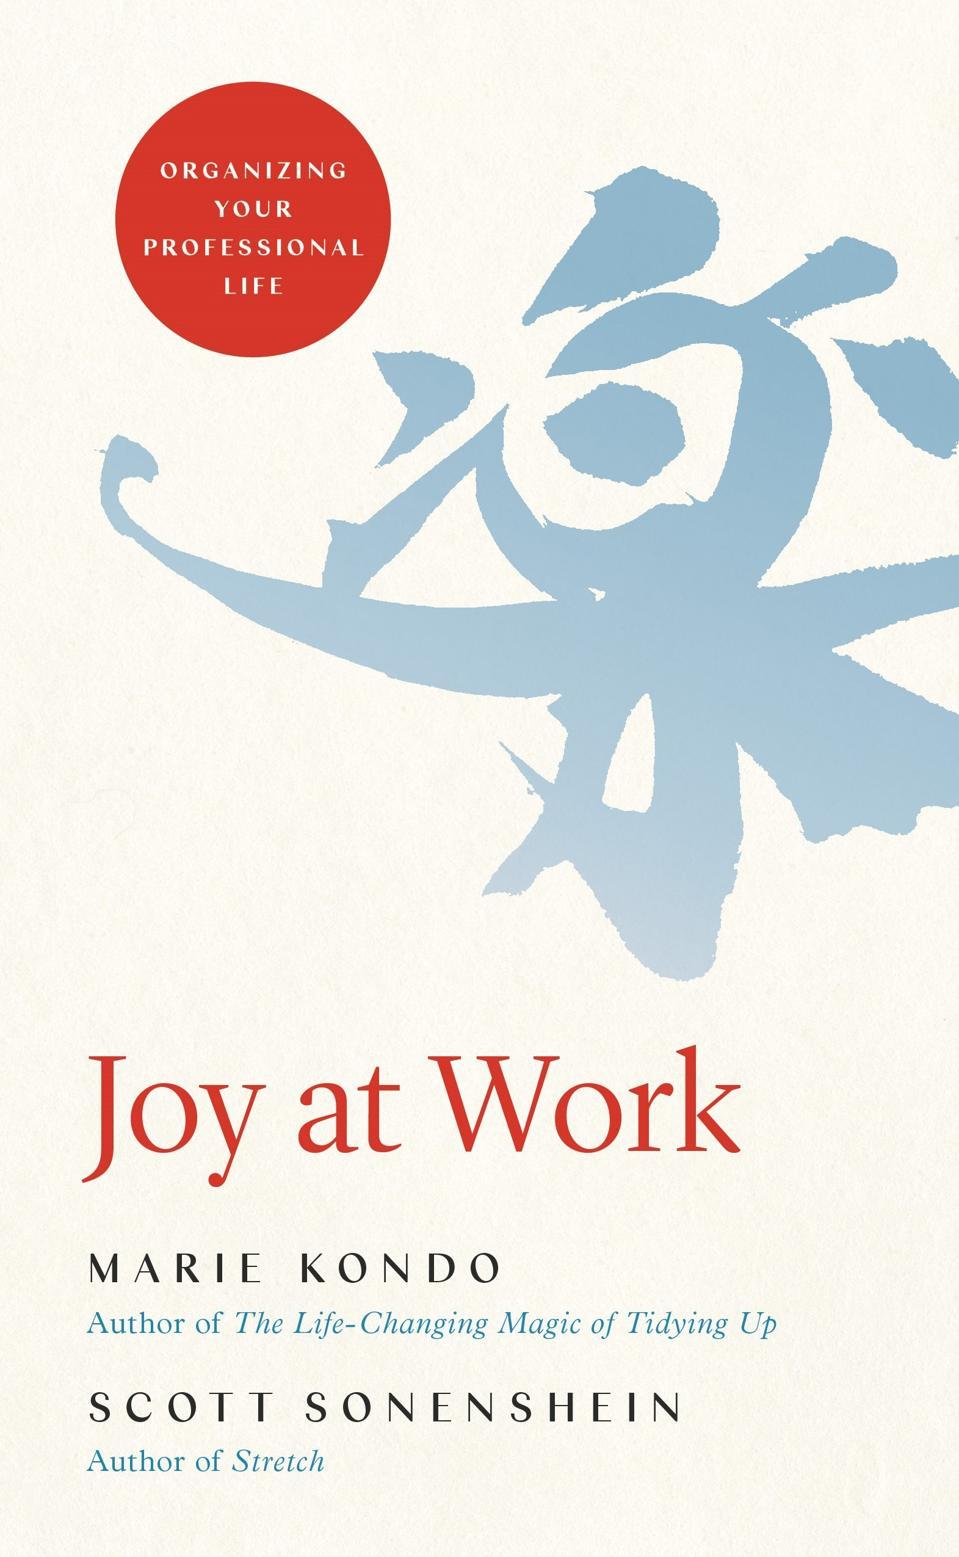 marie kondo joy at work organizing professional scott sonenshein workplace career book